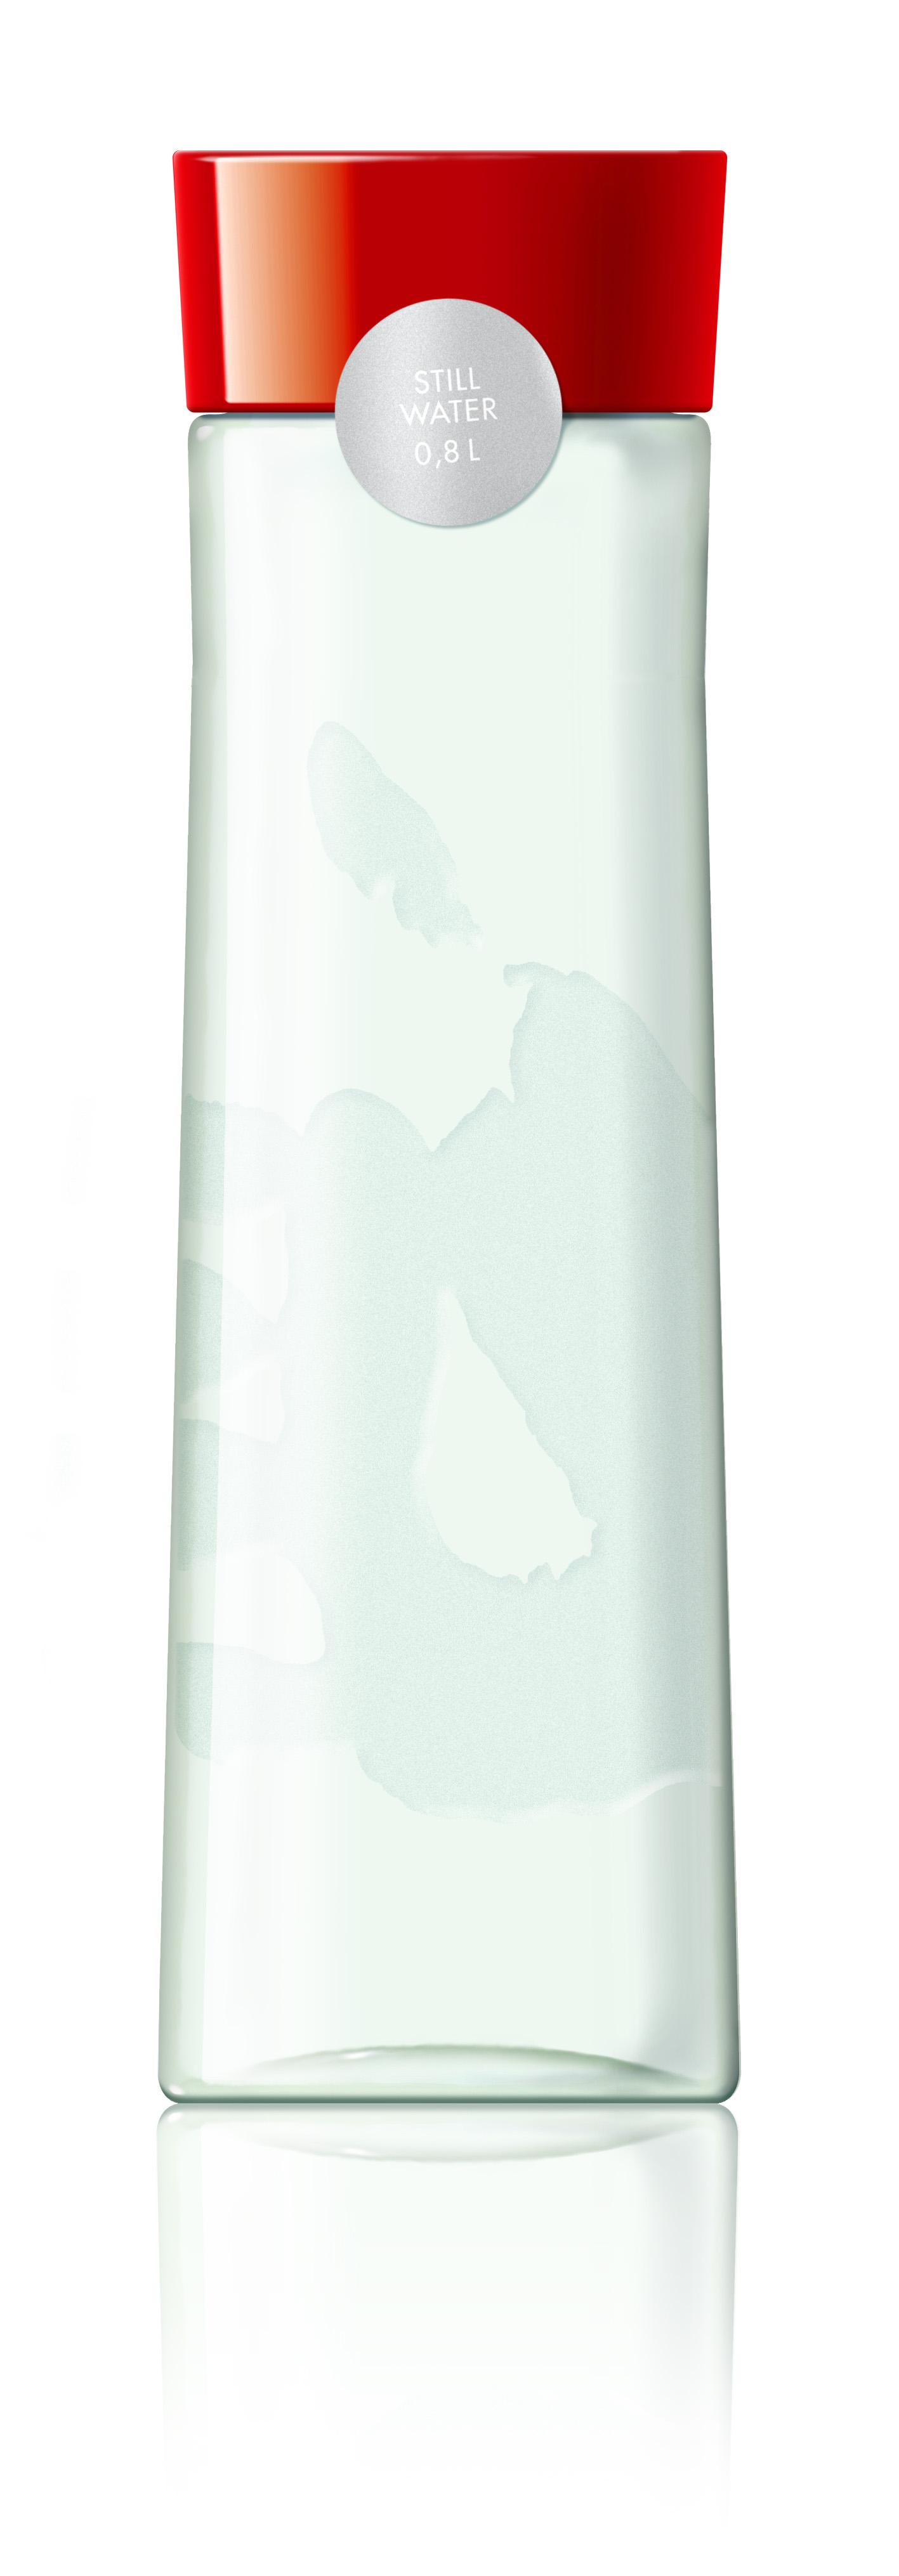 Scandic's own designed water bottle